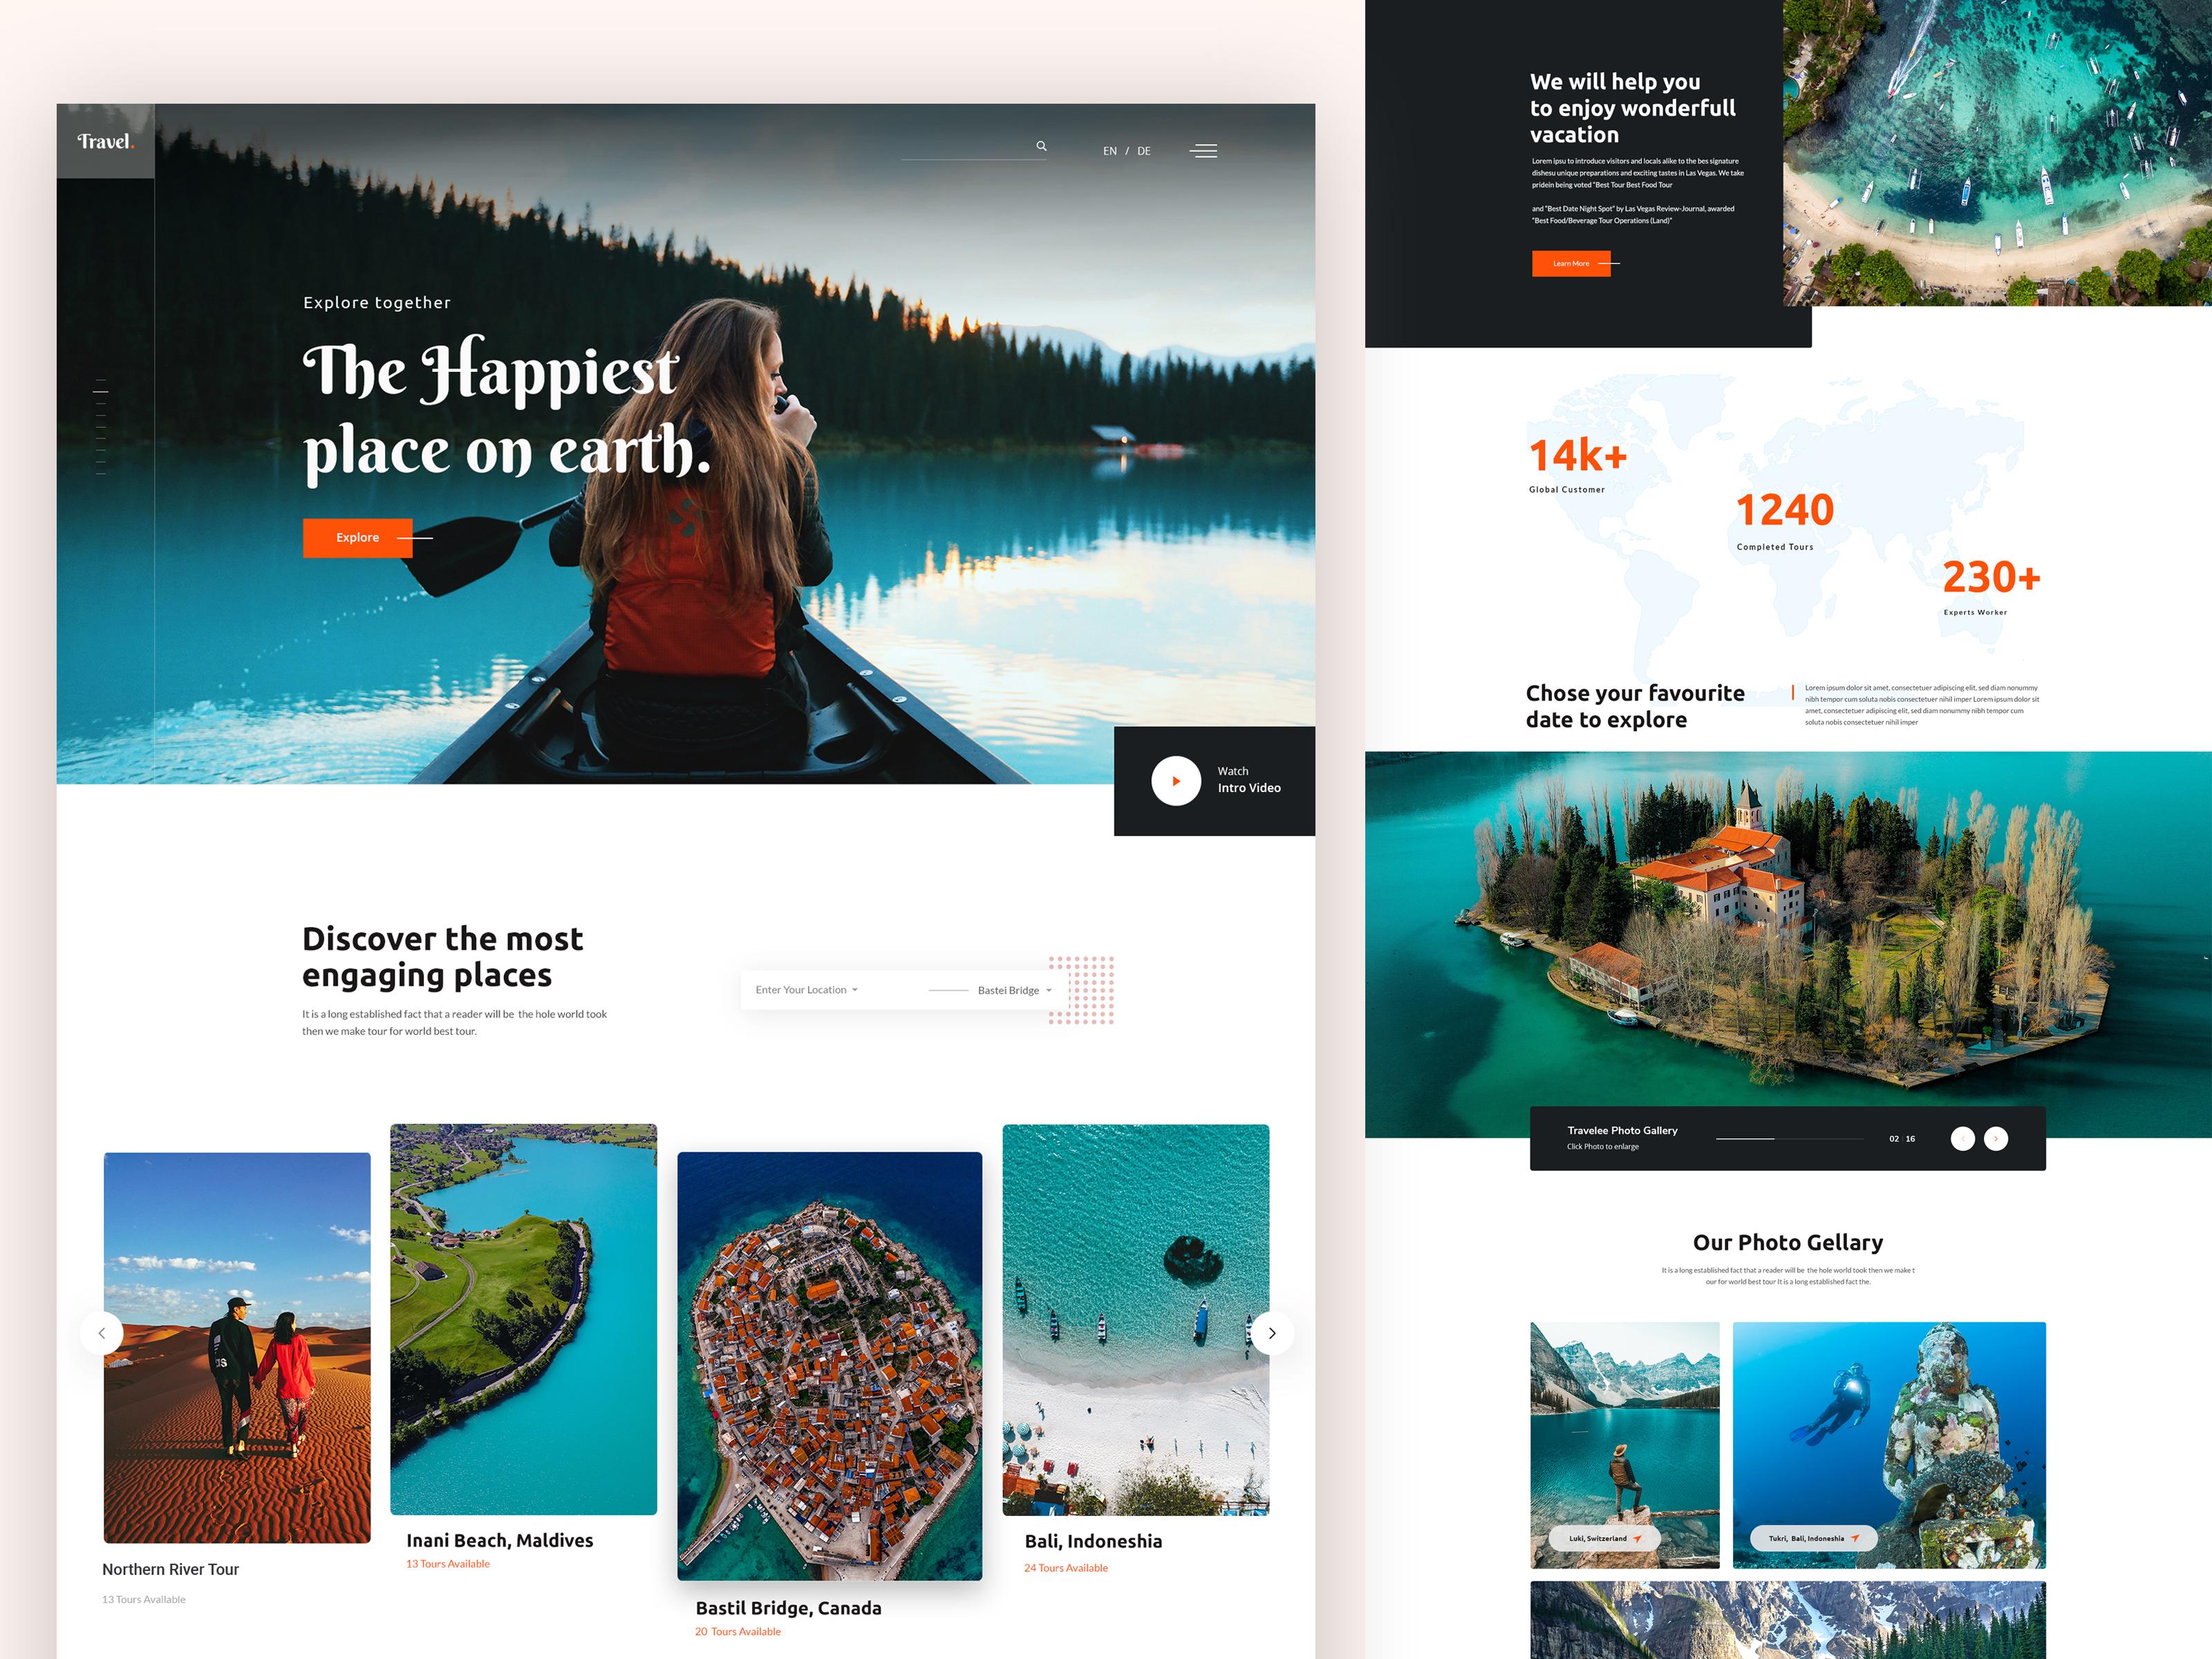 Tourism Website Design Example #1